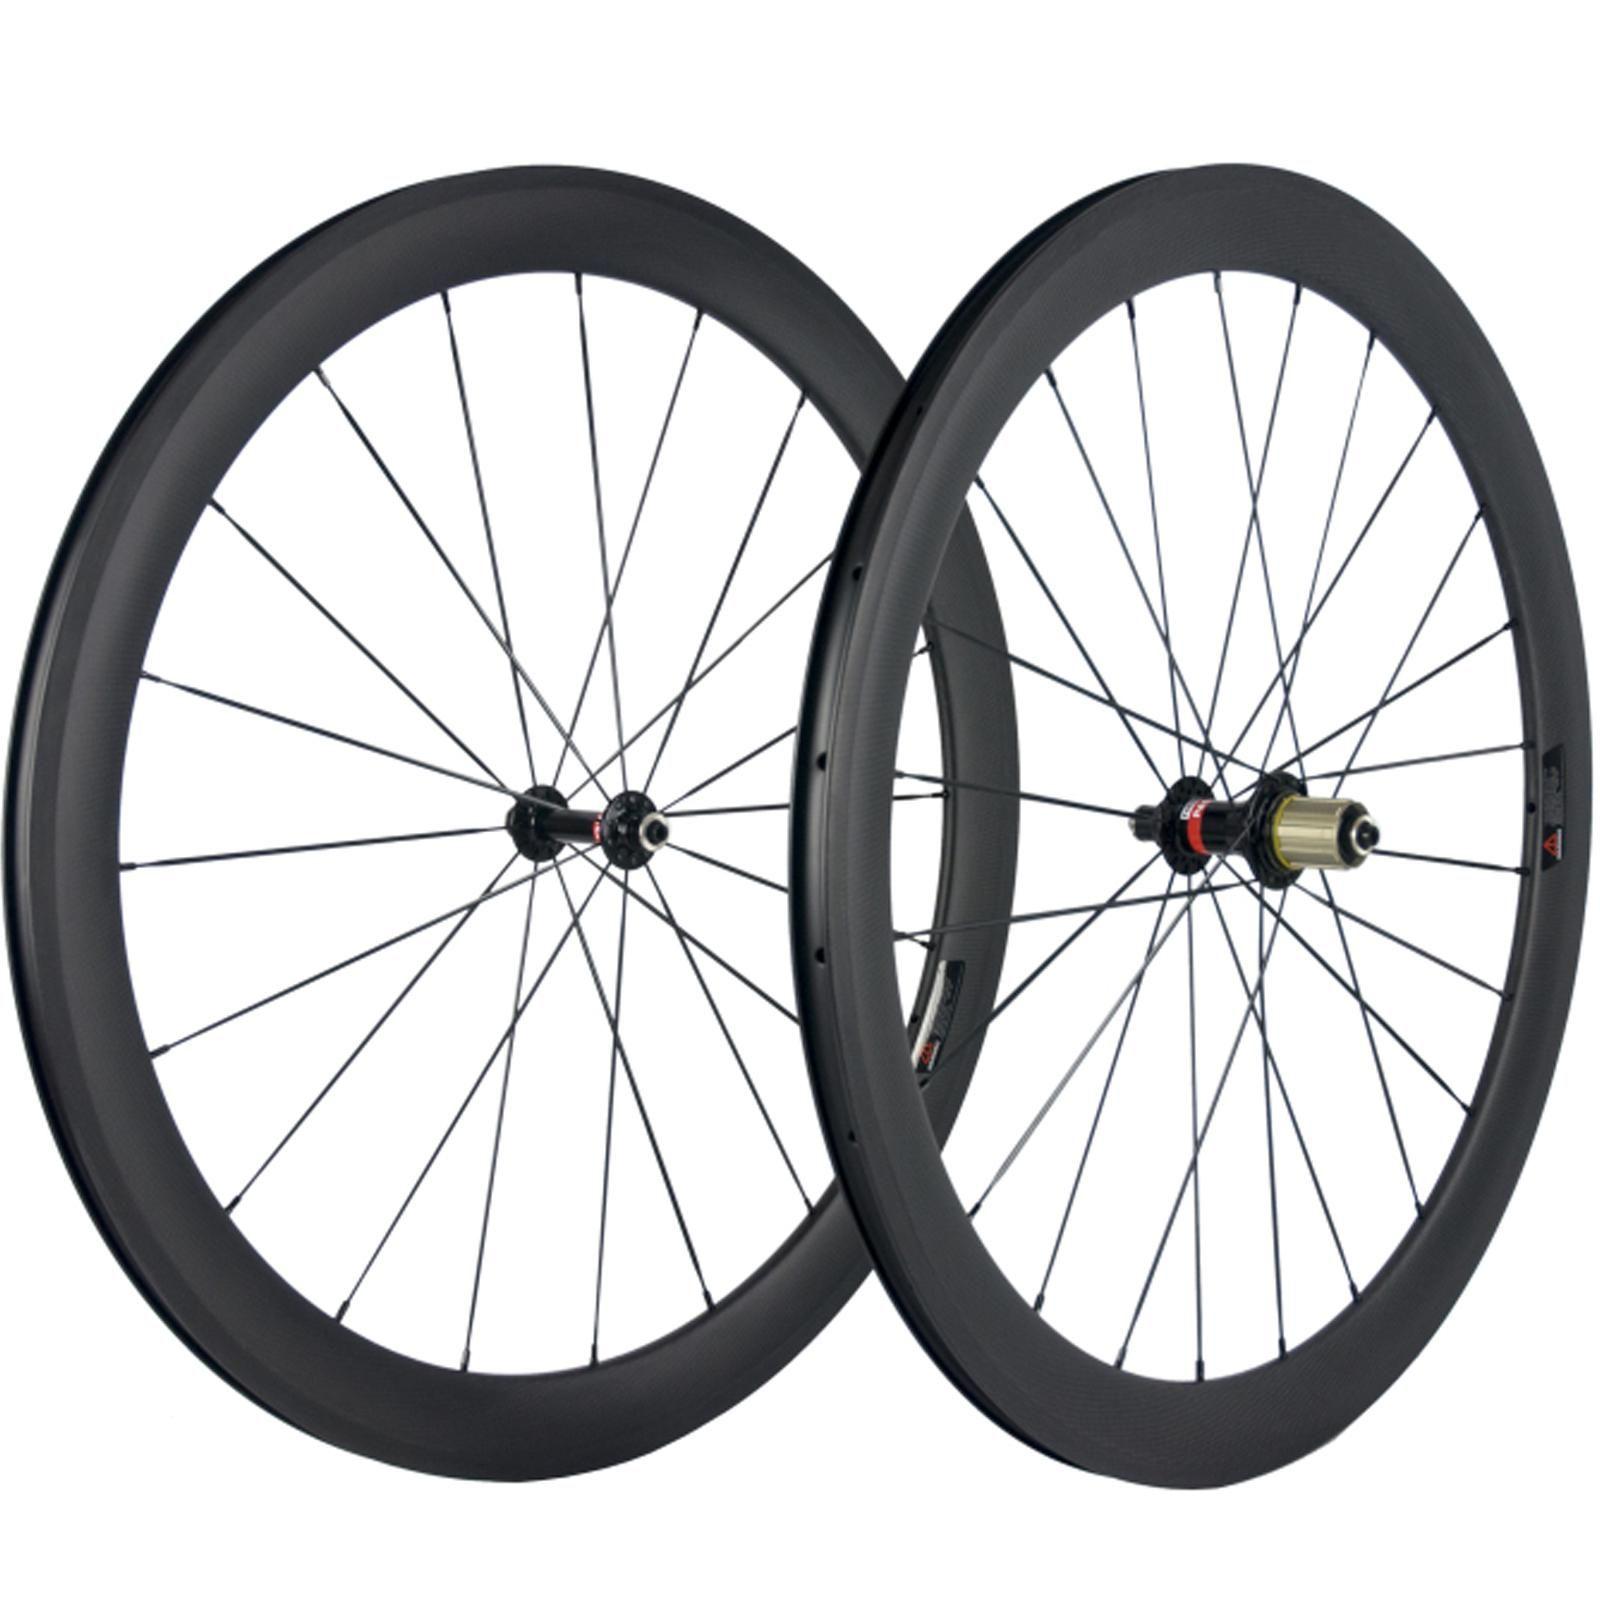 700C الفاصلة الكربون 50mm العجلات الطريق دراجة 3K ماتي الكربون عجلات الأحمر Novatec محور 291 المحور سباق العجلات